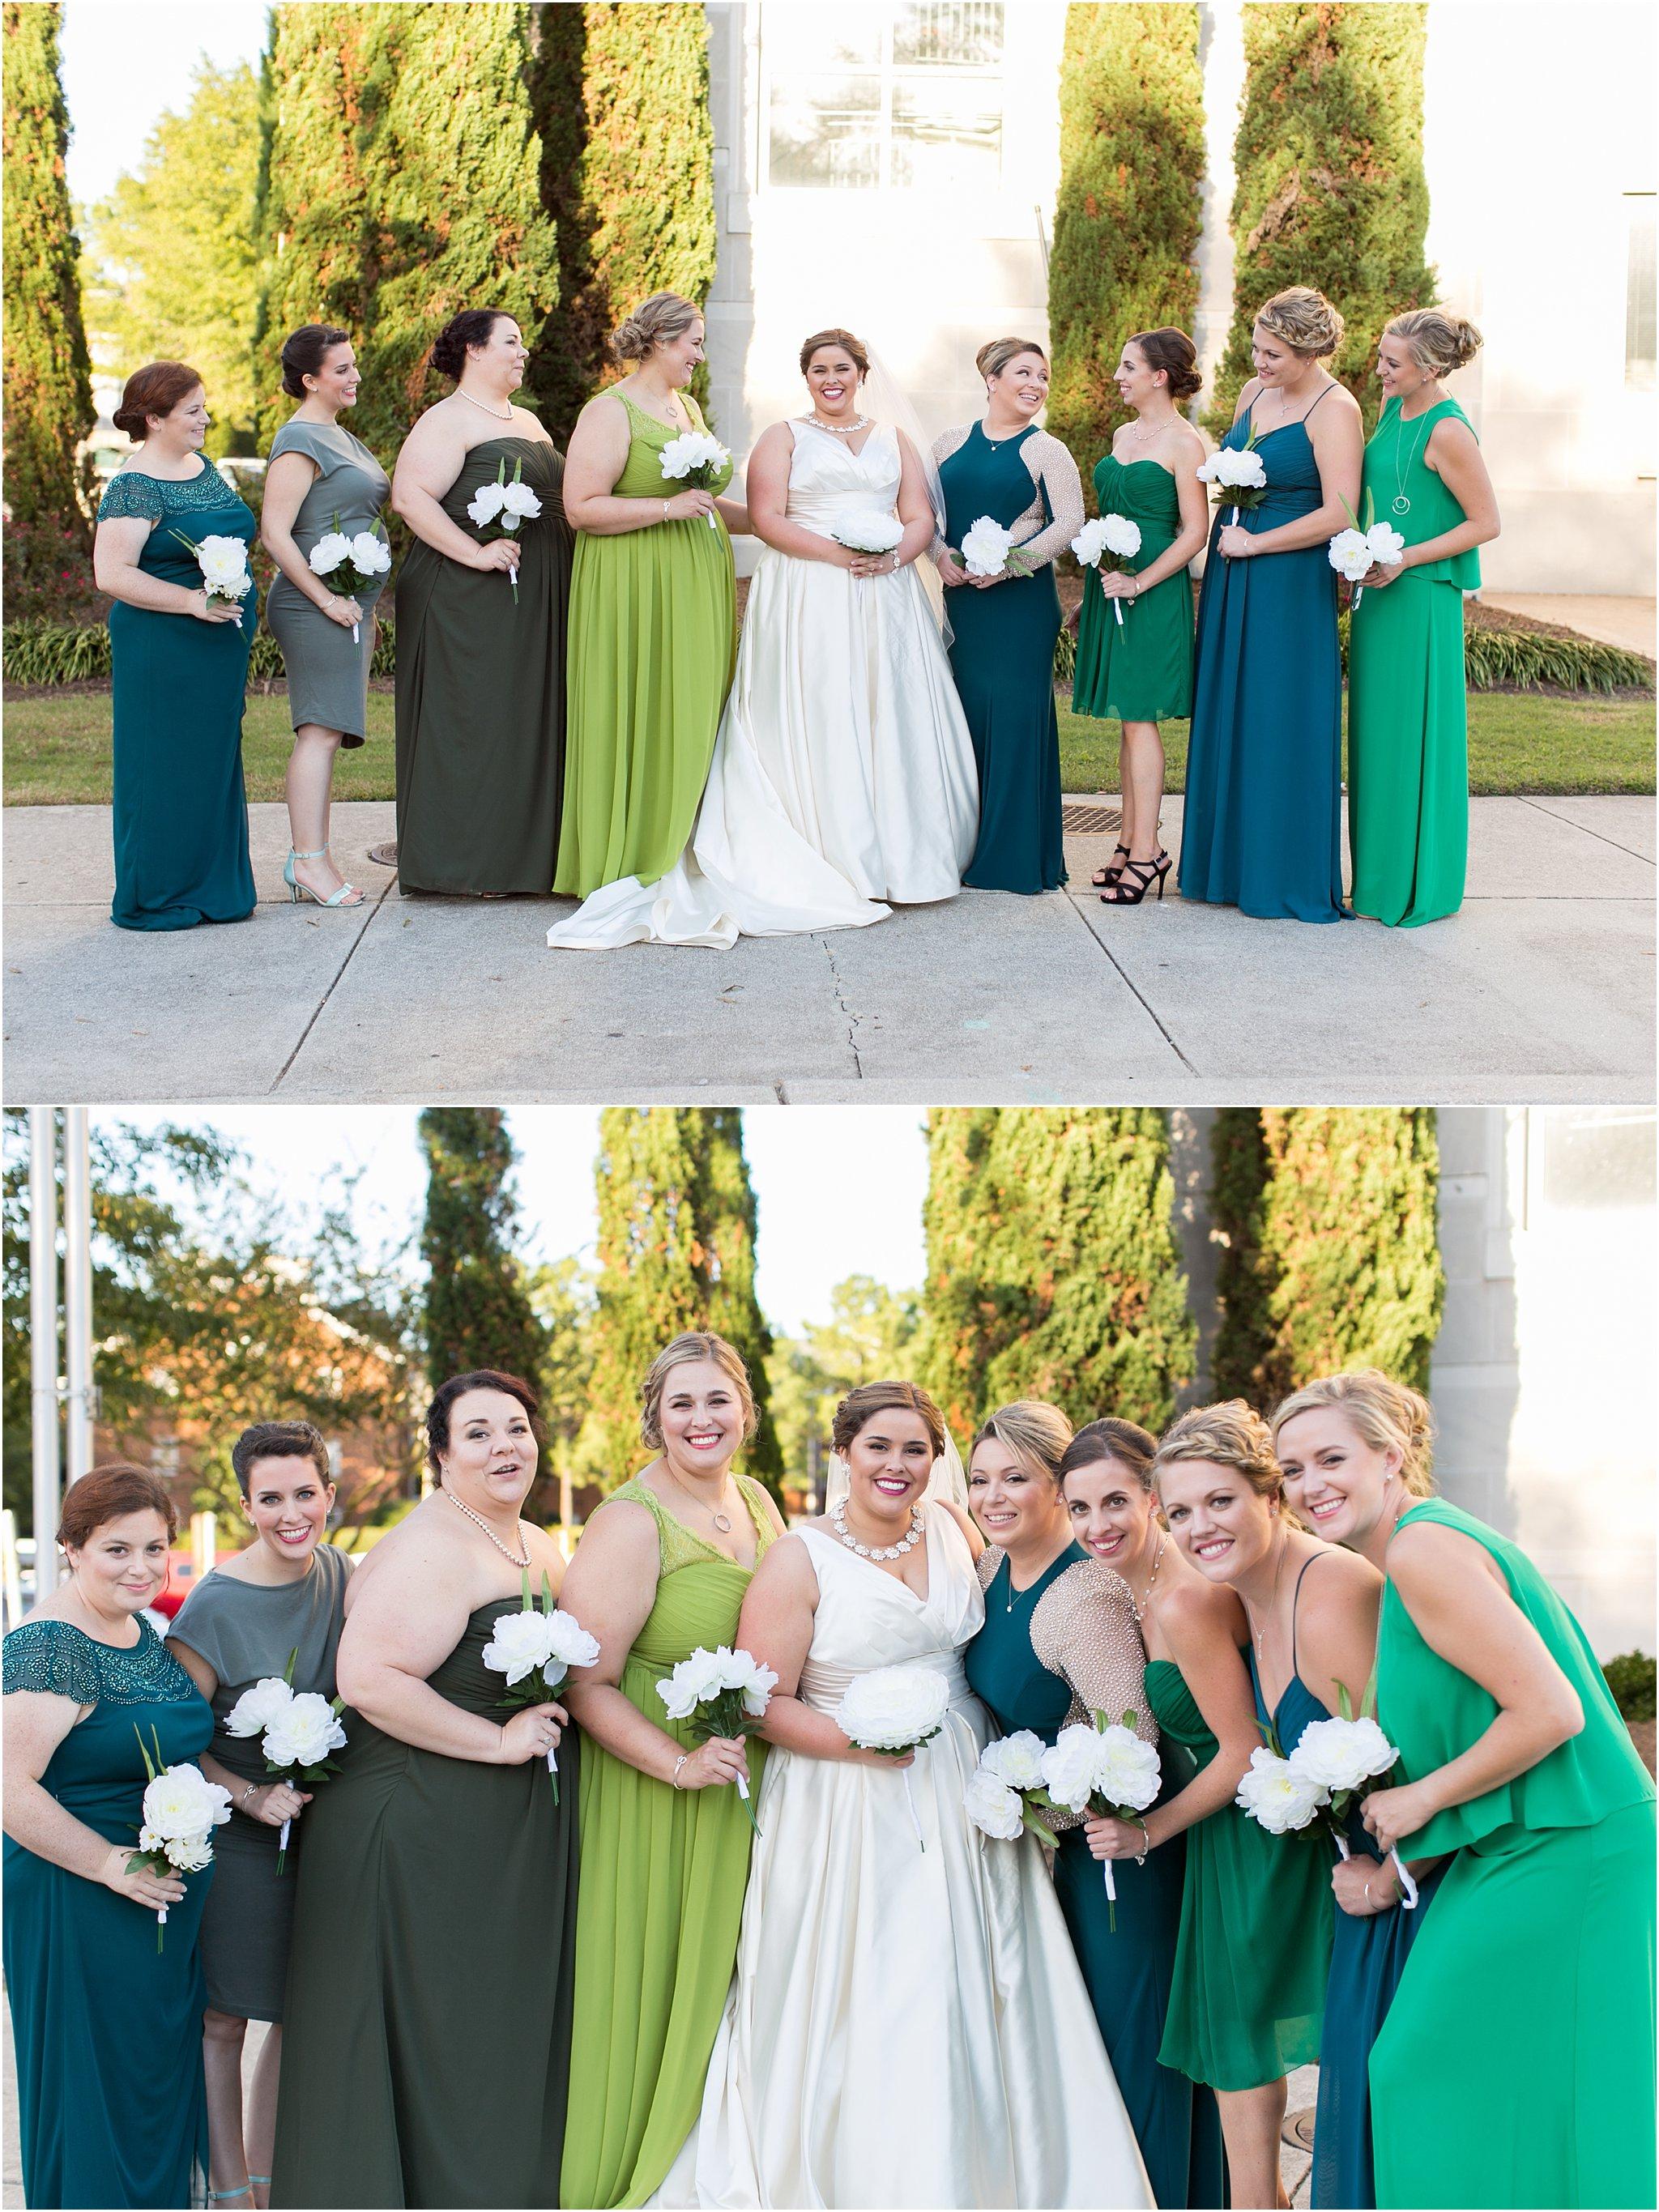 va_jessica_ryan_photography_virginia_wedding_norfolk_harrison_opera_house_norfolk_arts_district_portraits_3801